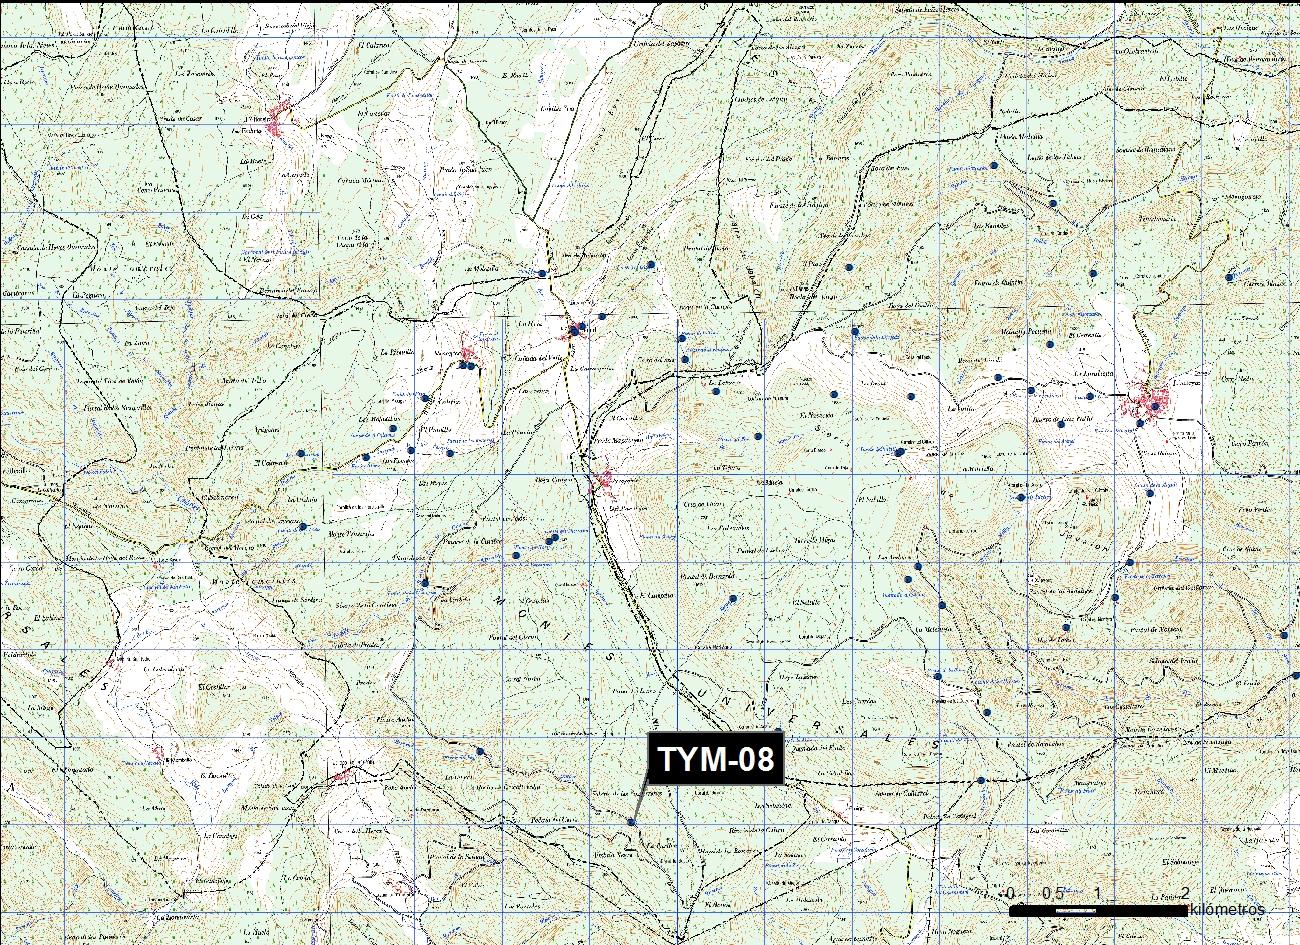 TYM_08_M.V.LOZANO_FONTARRONES II_MAP.TOPO 1